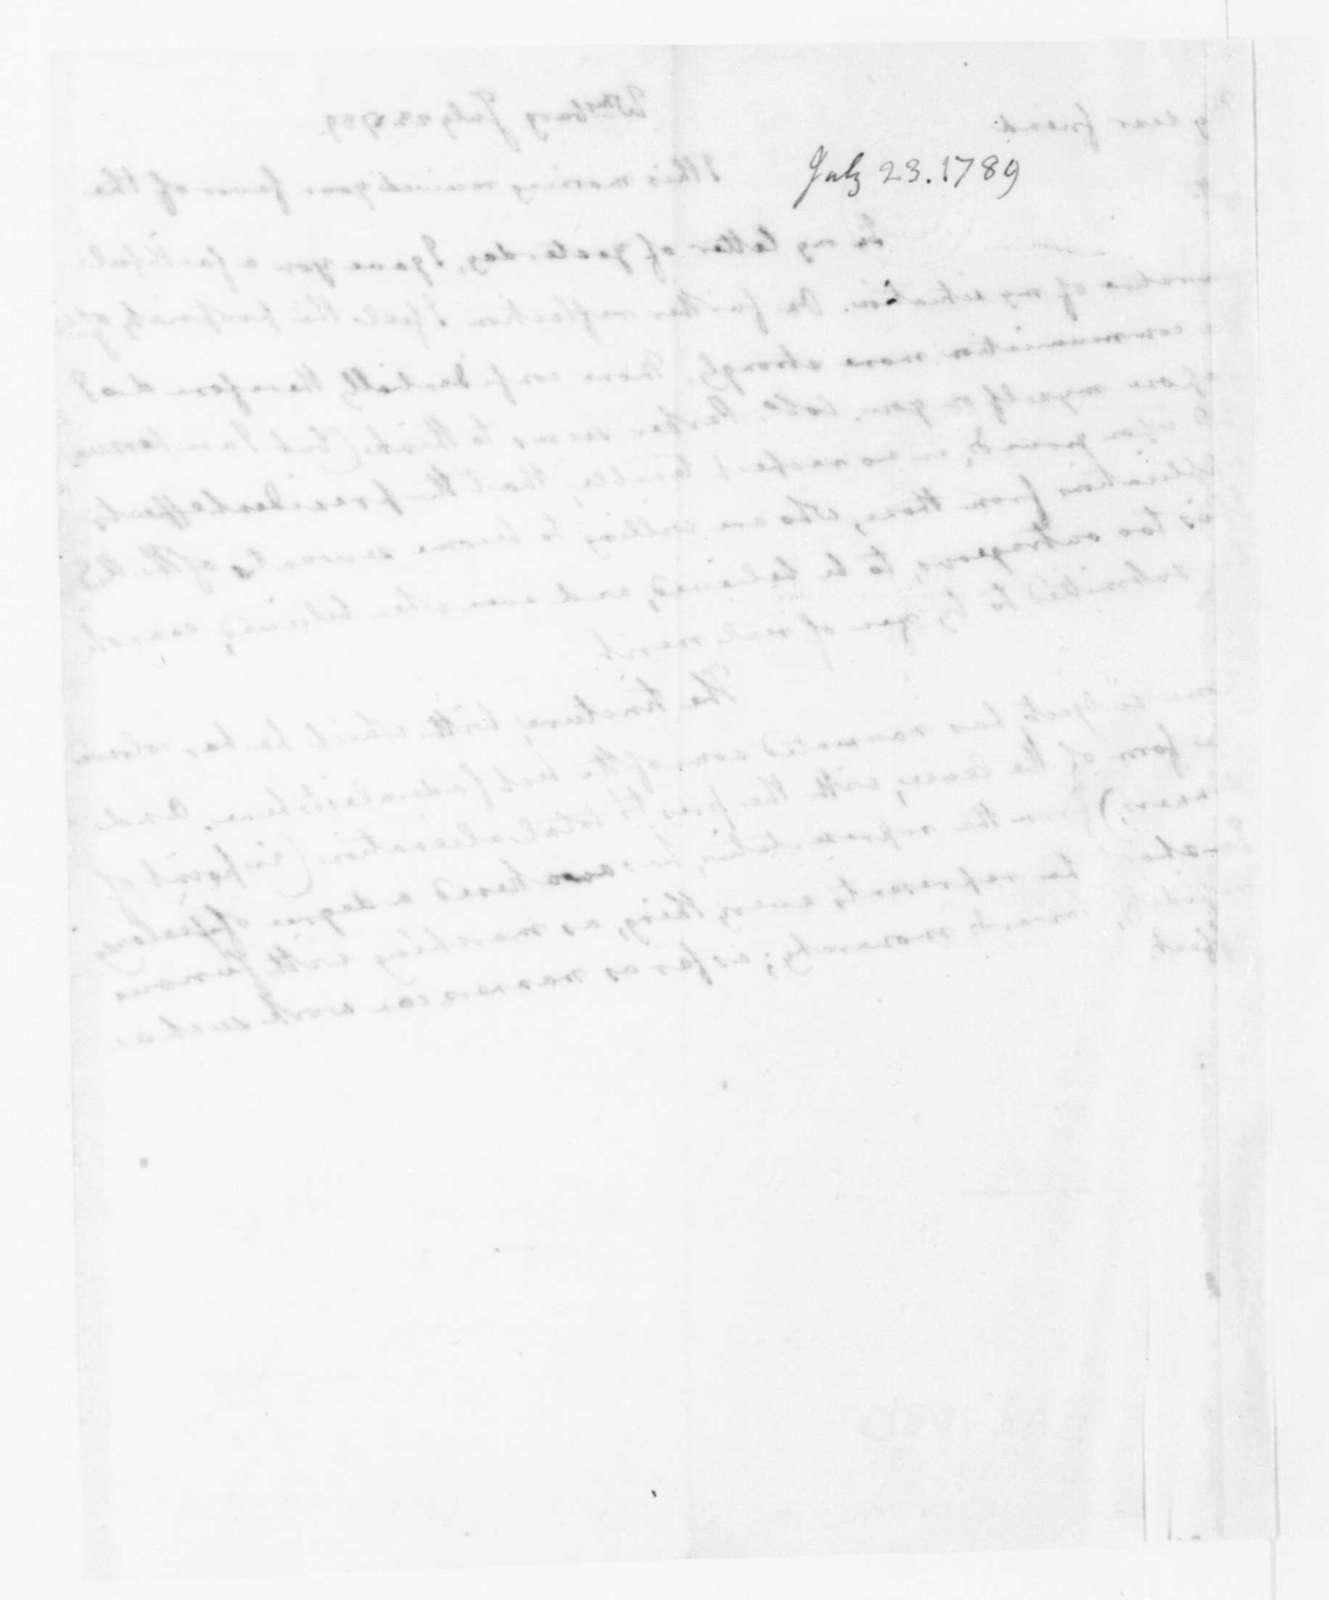 Edmund Randolph to James Madison, July 23, 1789.